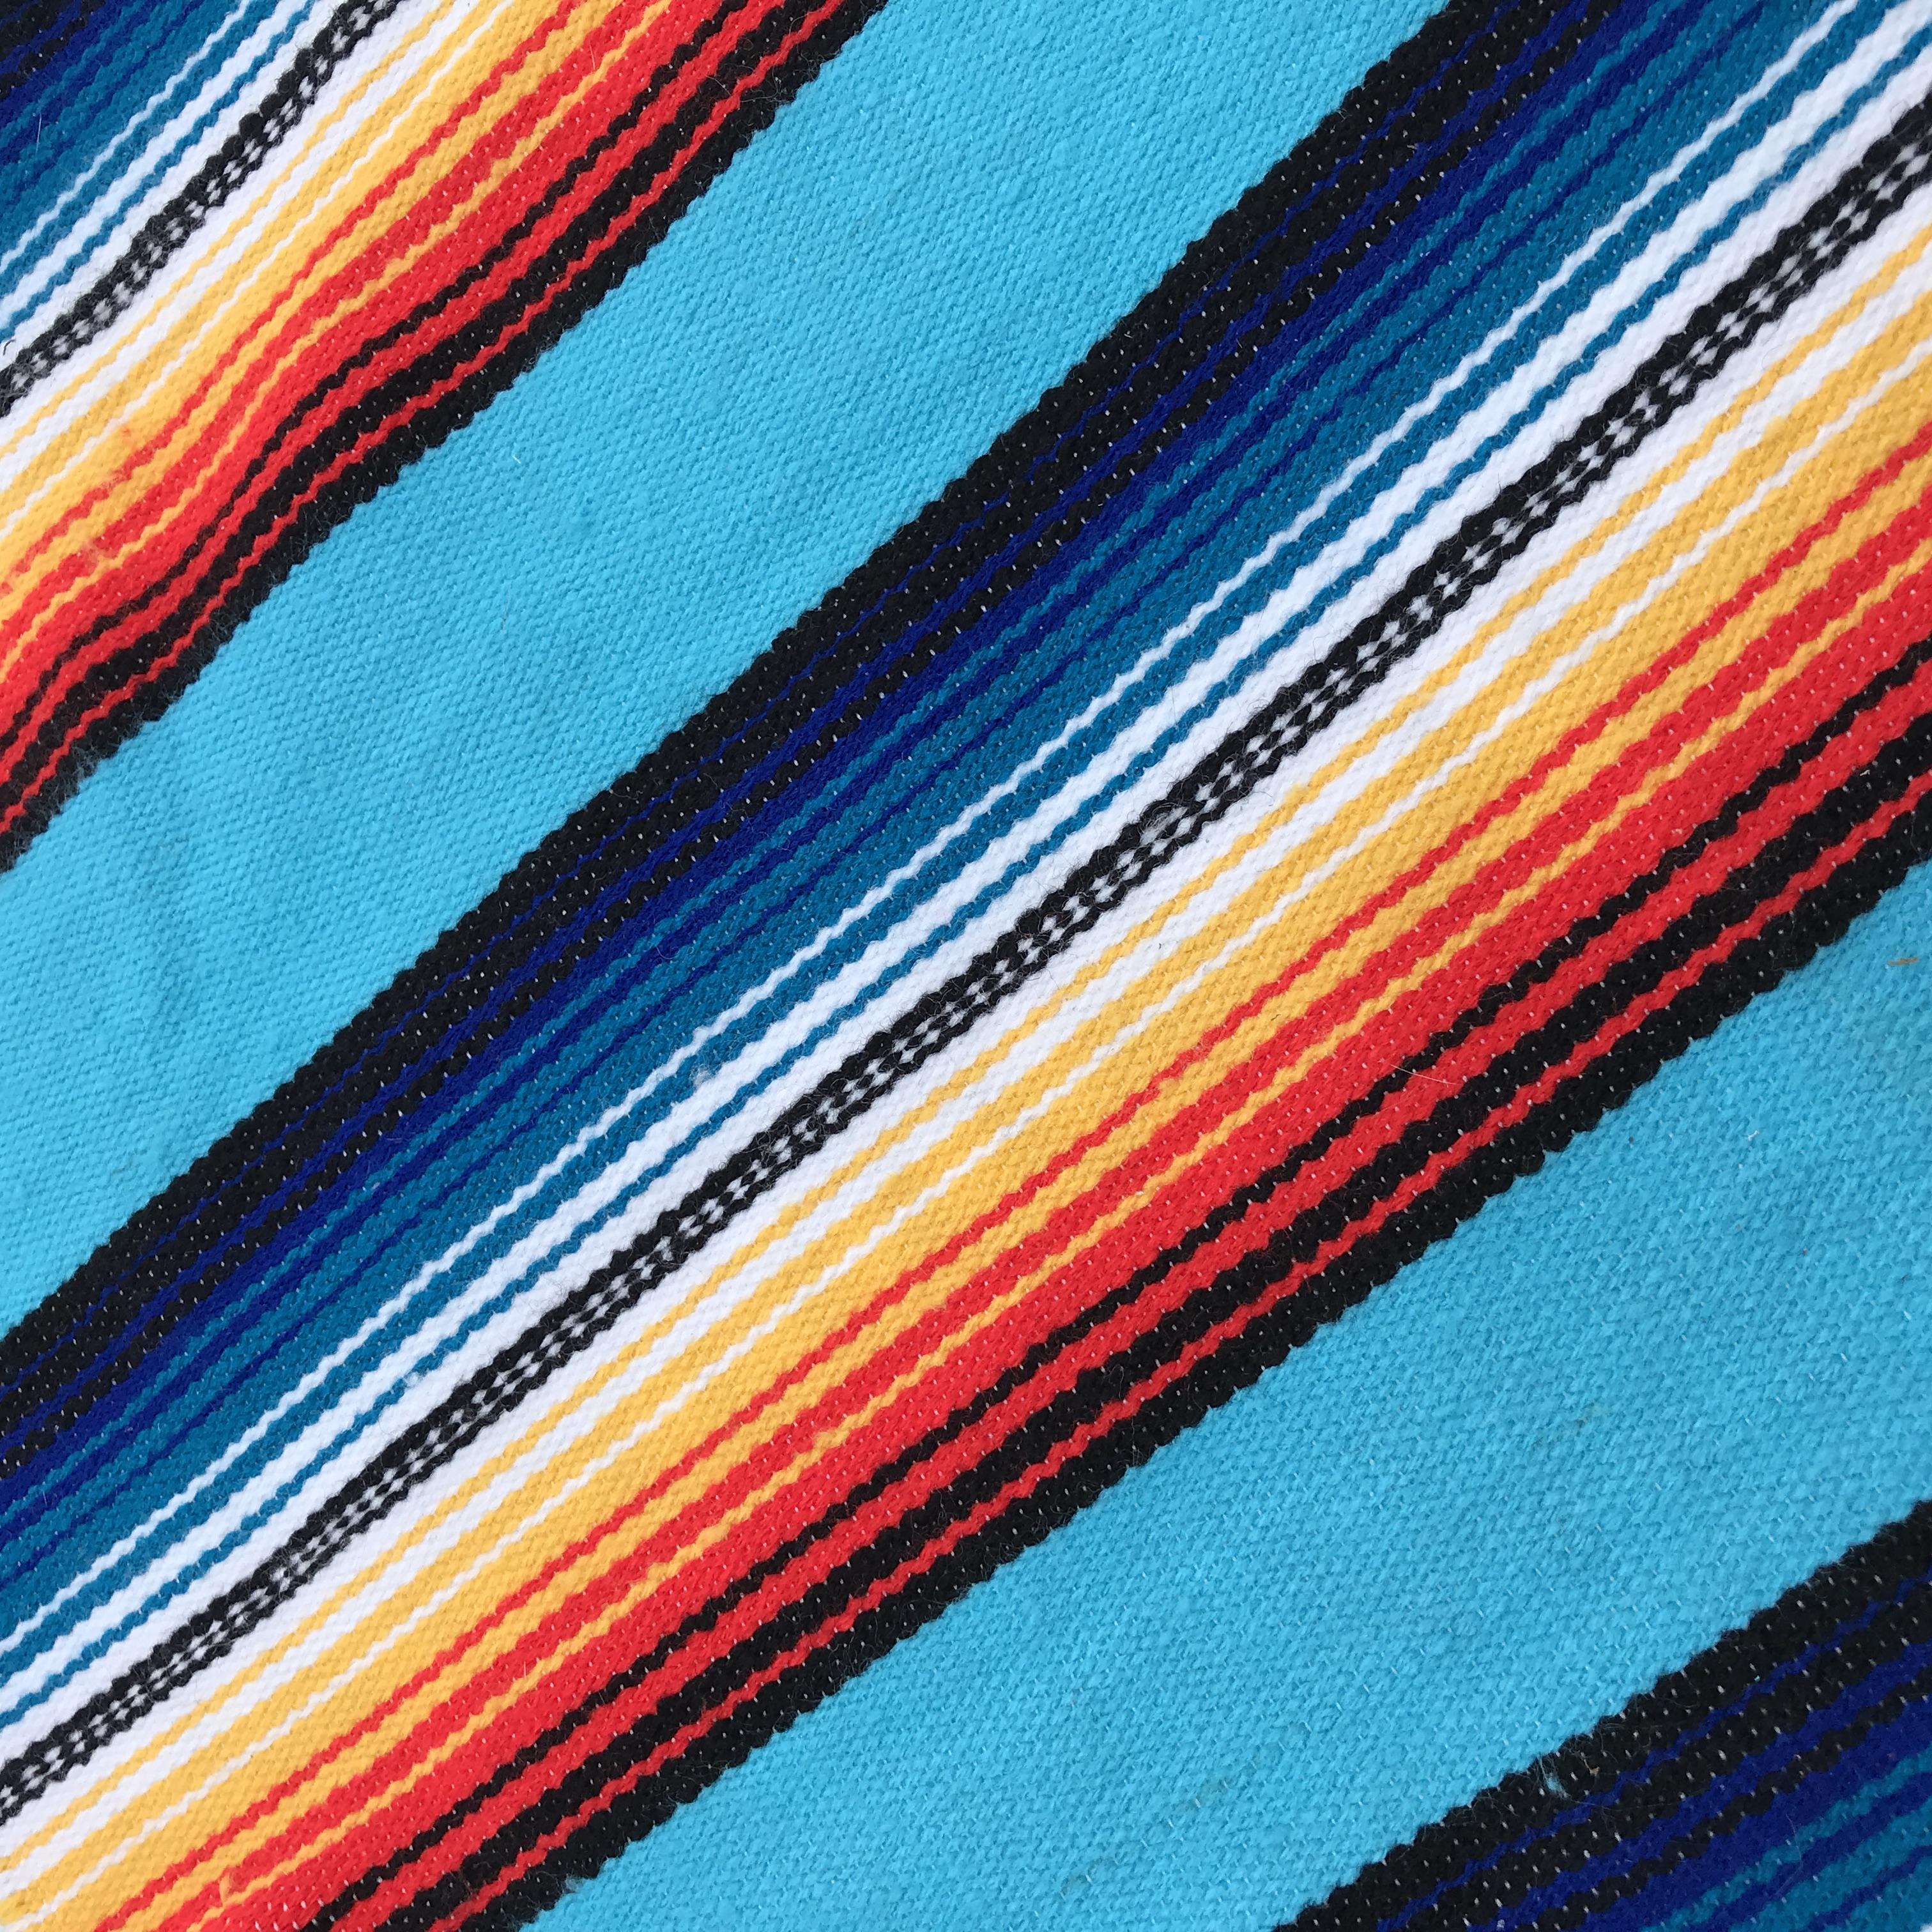 Turquoise Serape Material